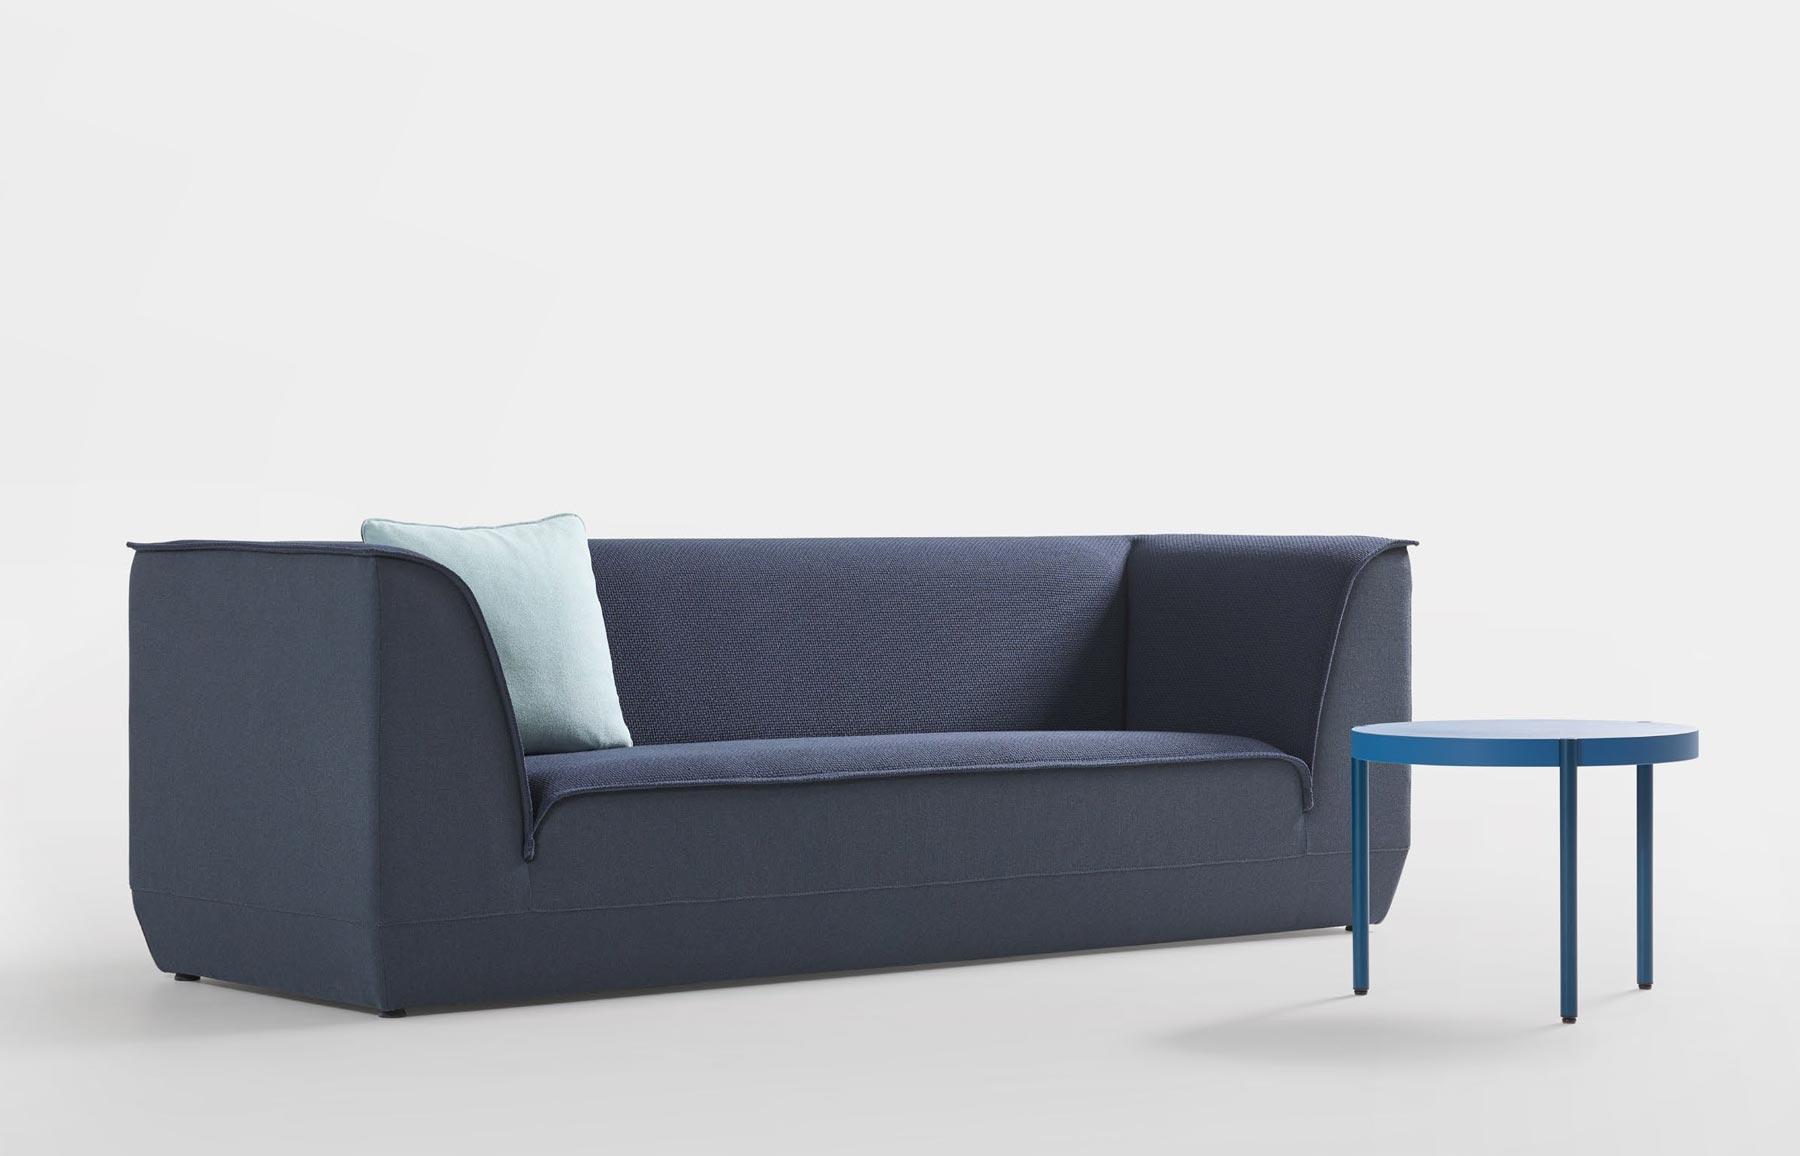 Island Sofa With Palladio